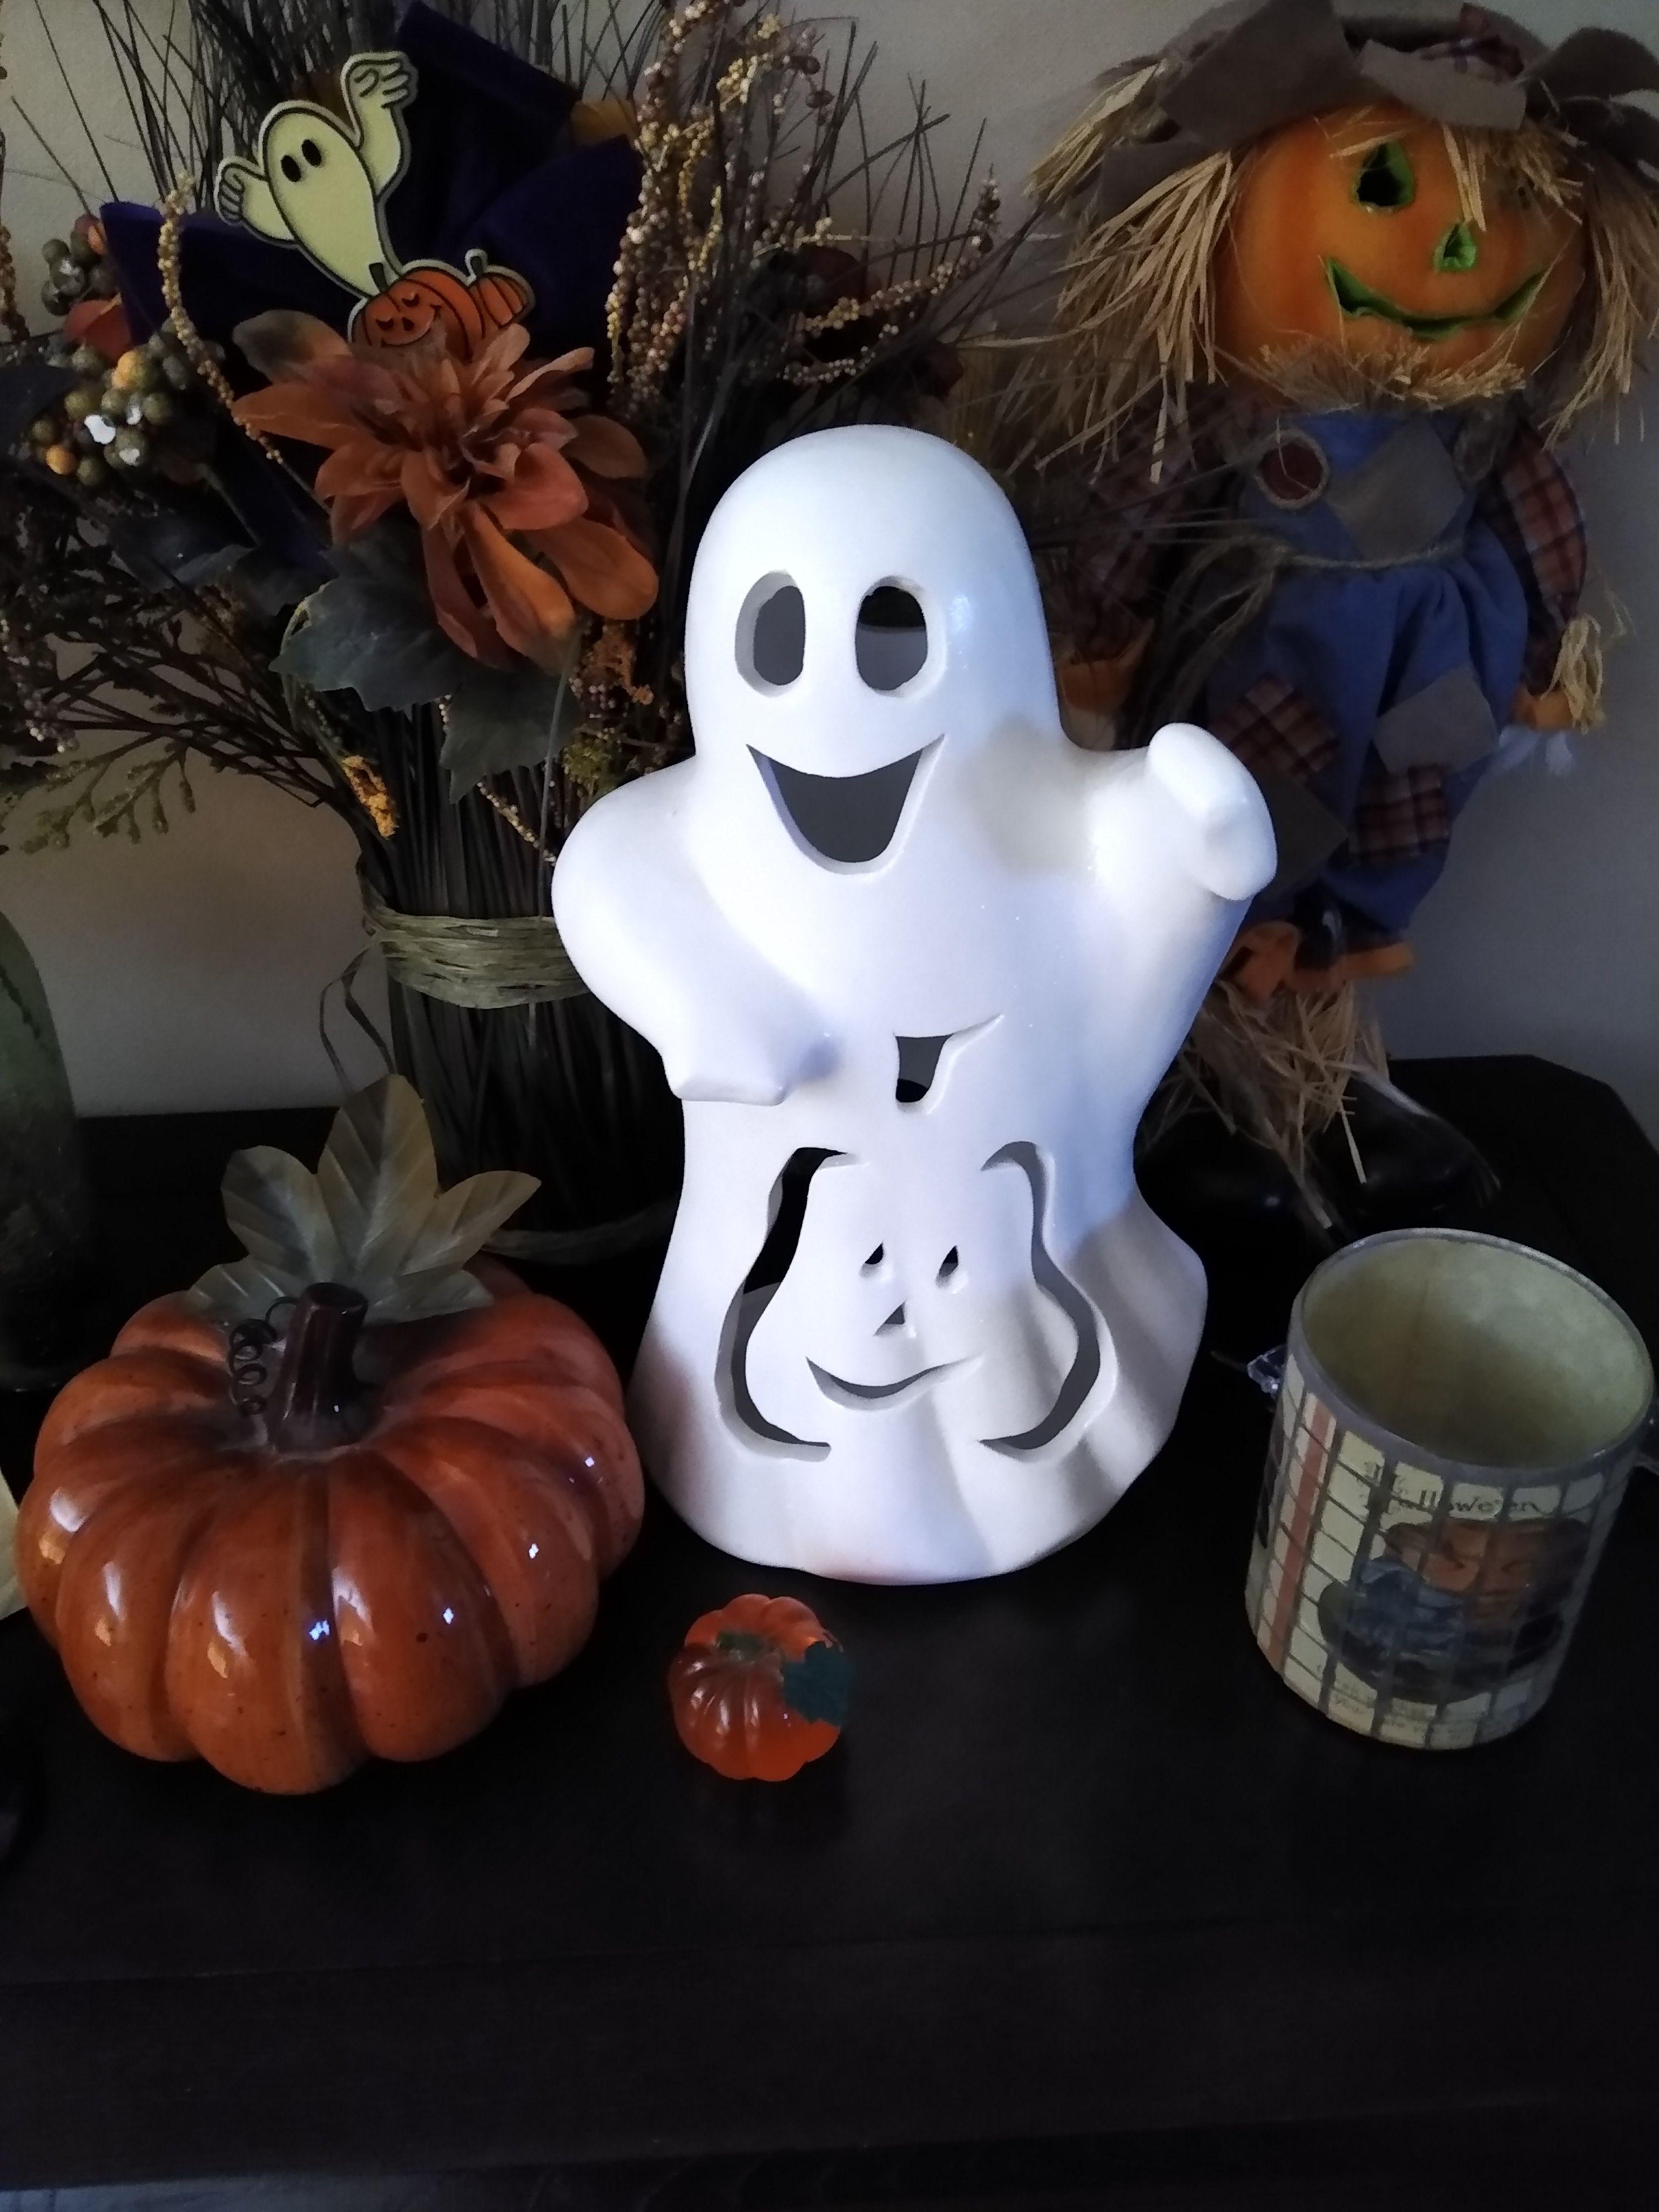 Halloween display 2019 Halloween displays, Halloween